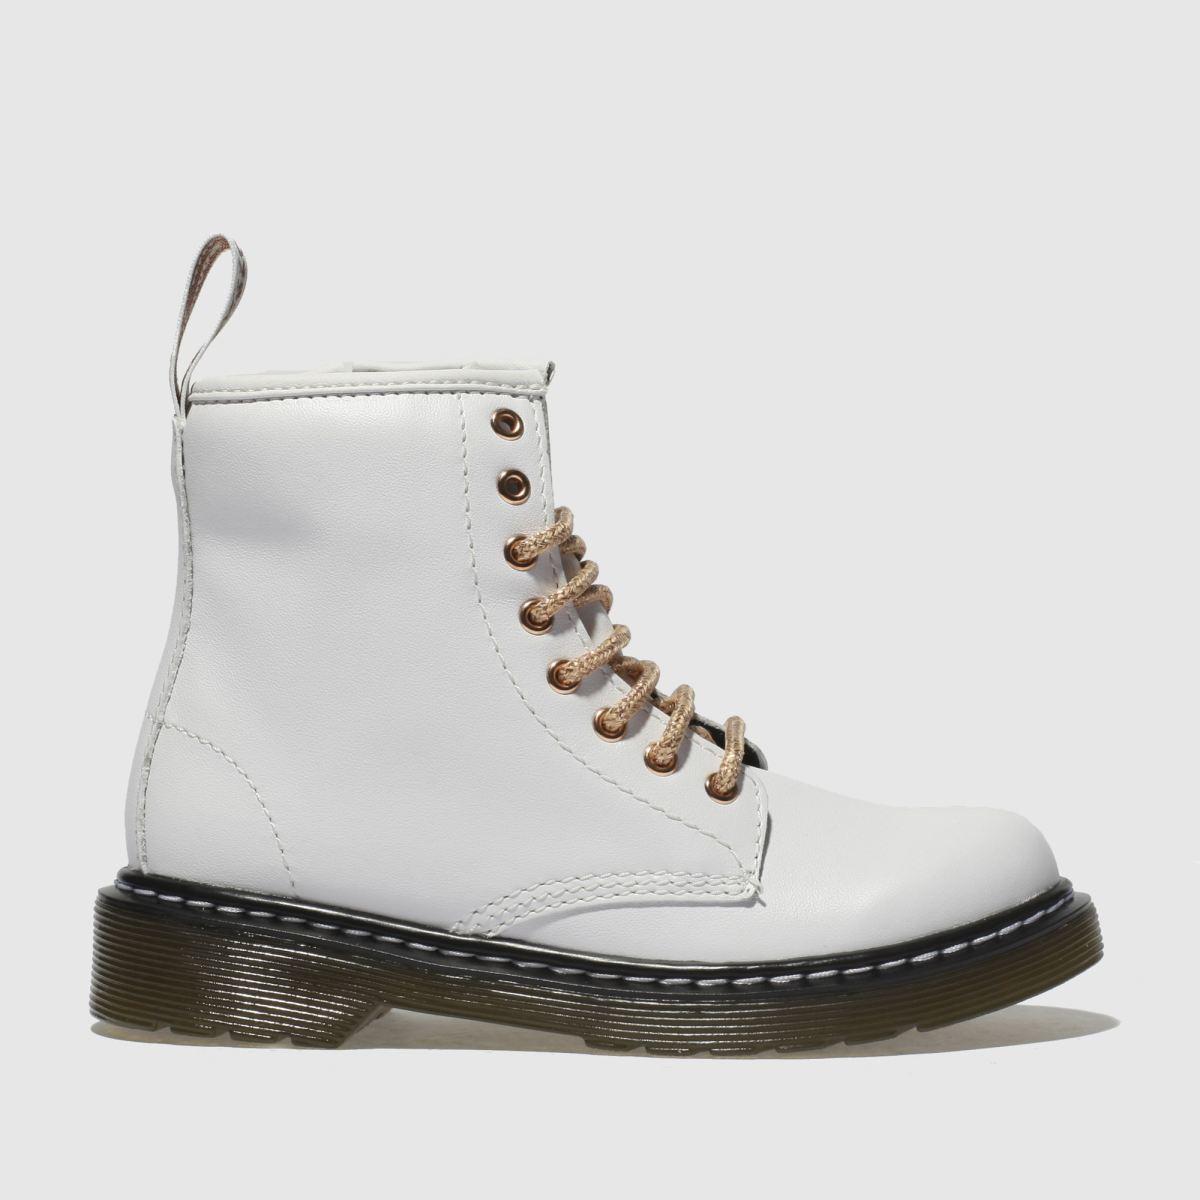 Dr Martens White & Gold 1460 8 Eye Boot Boots Junior